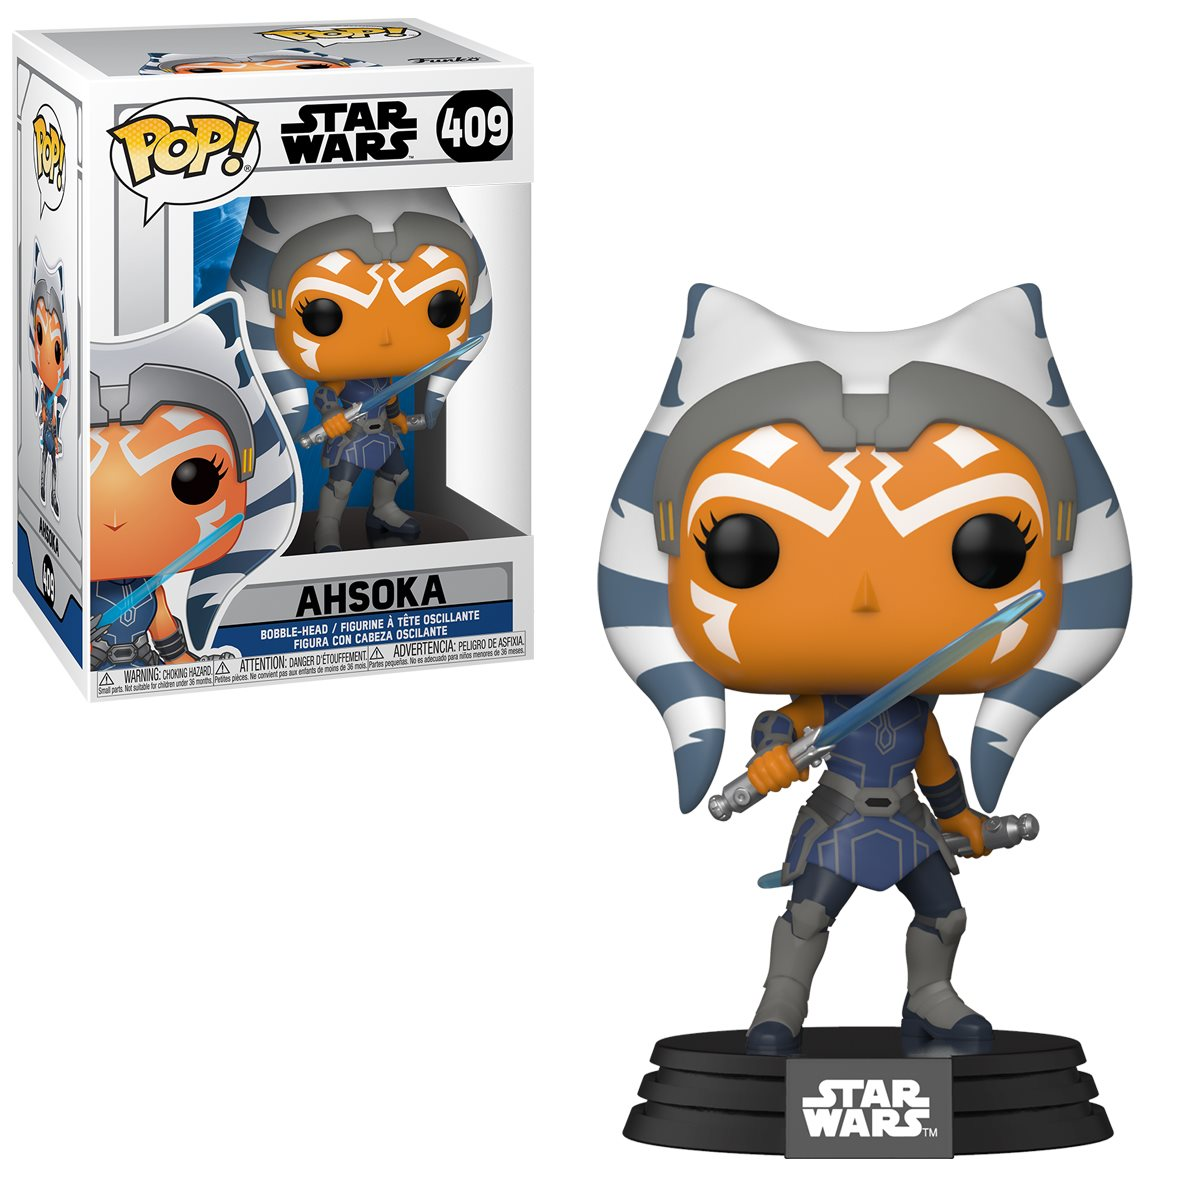 PRÉ VENDA: Funko Pop! Ahsoka: Star Wars: The Clone Wars #409 - Funko